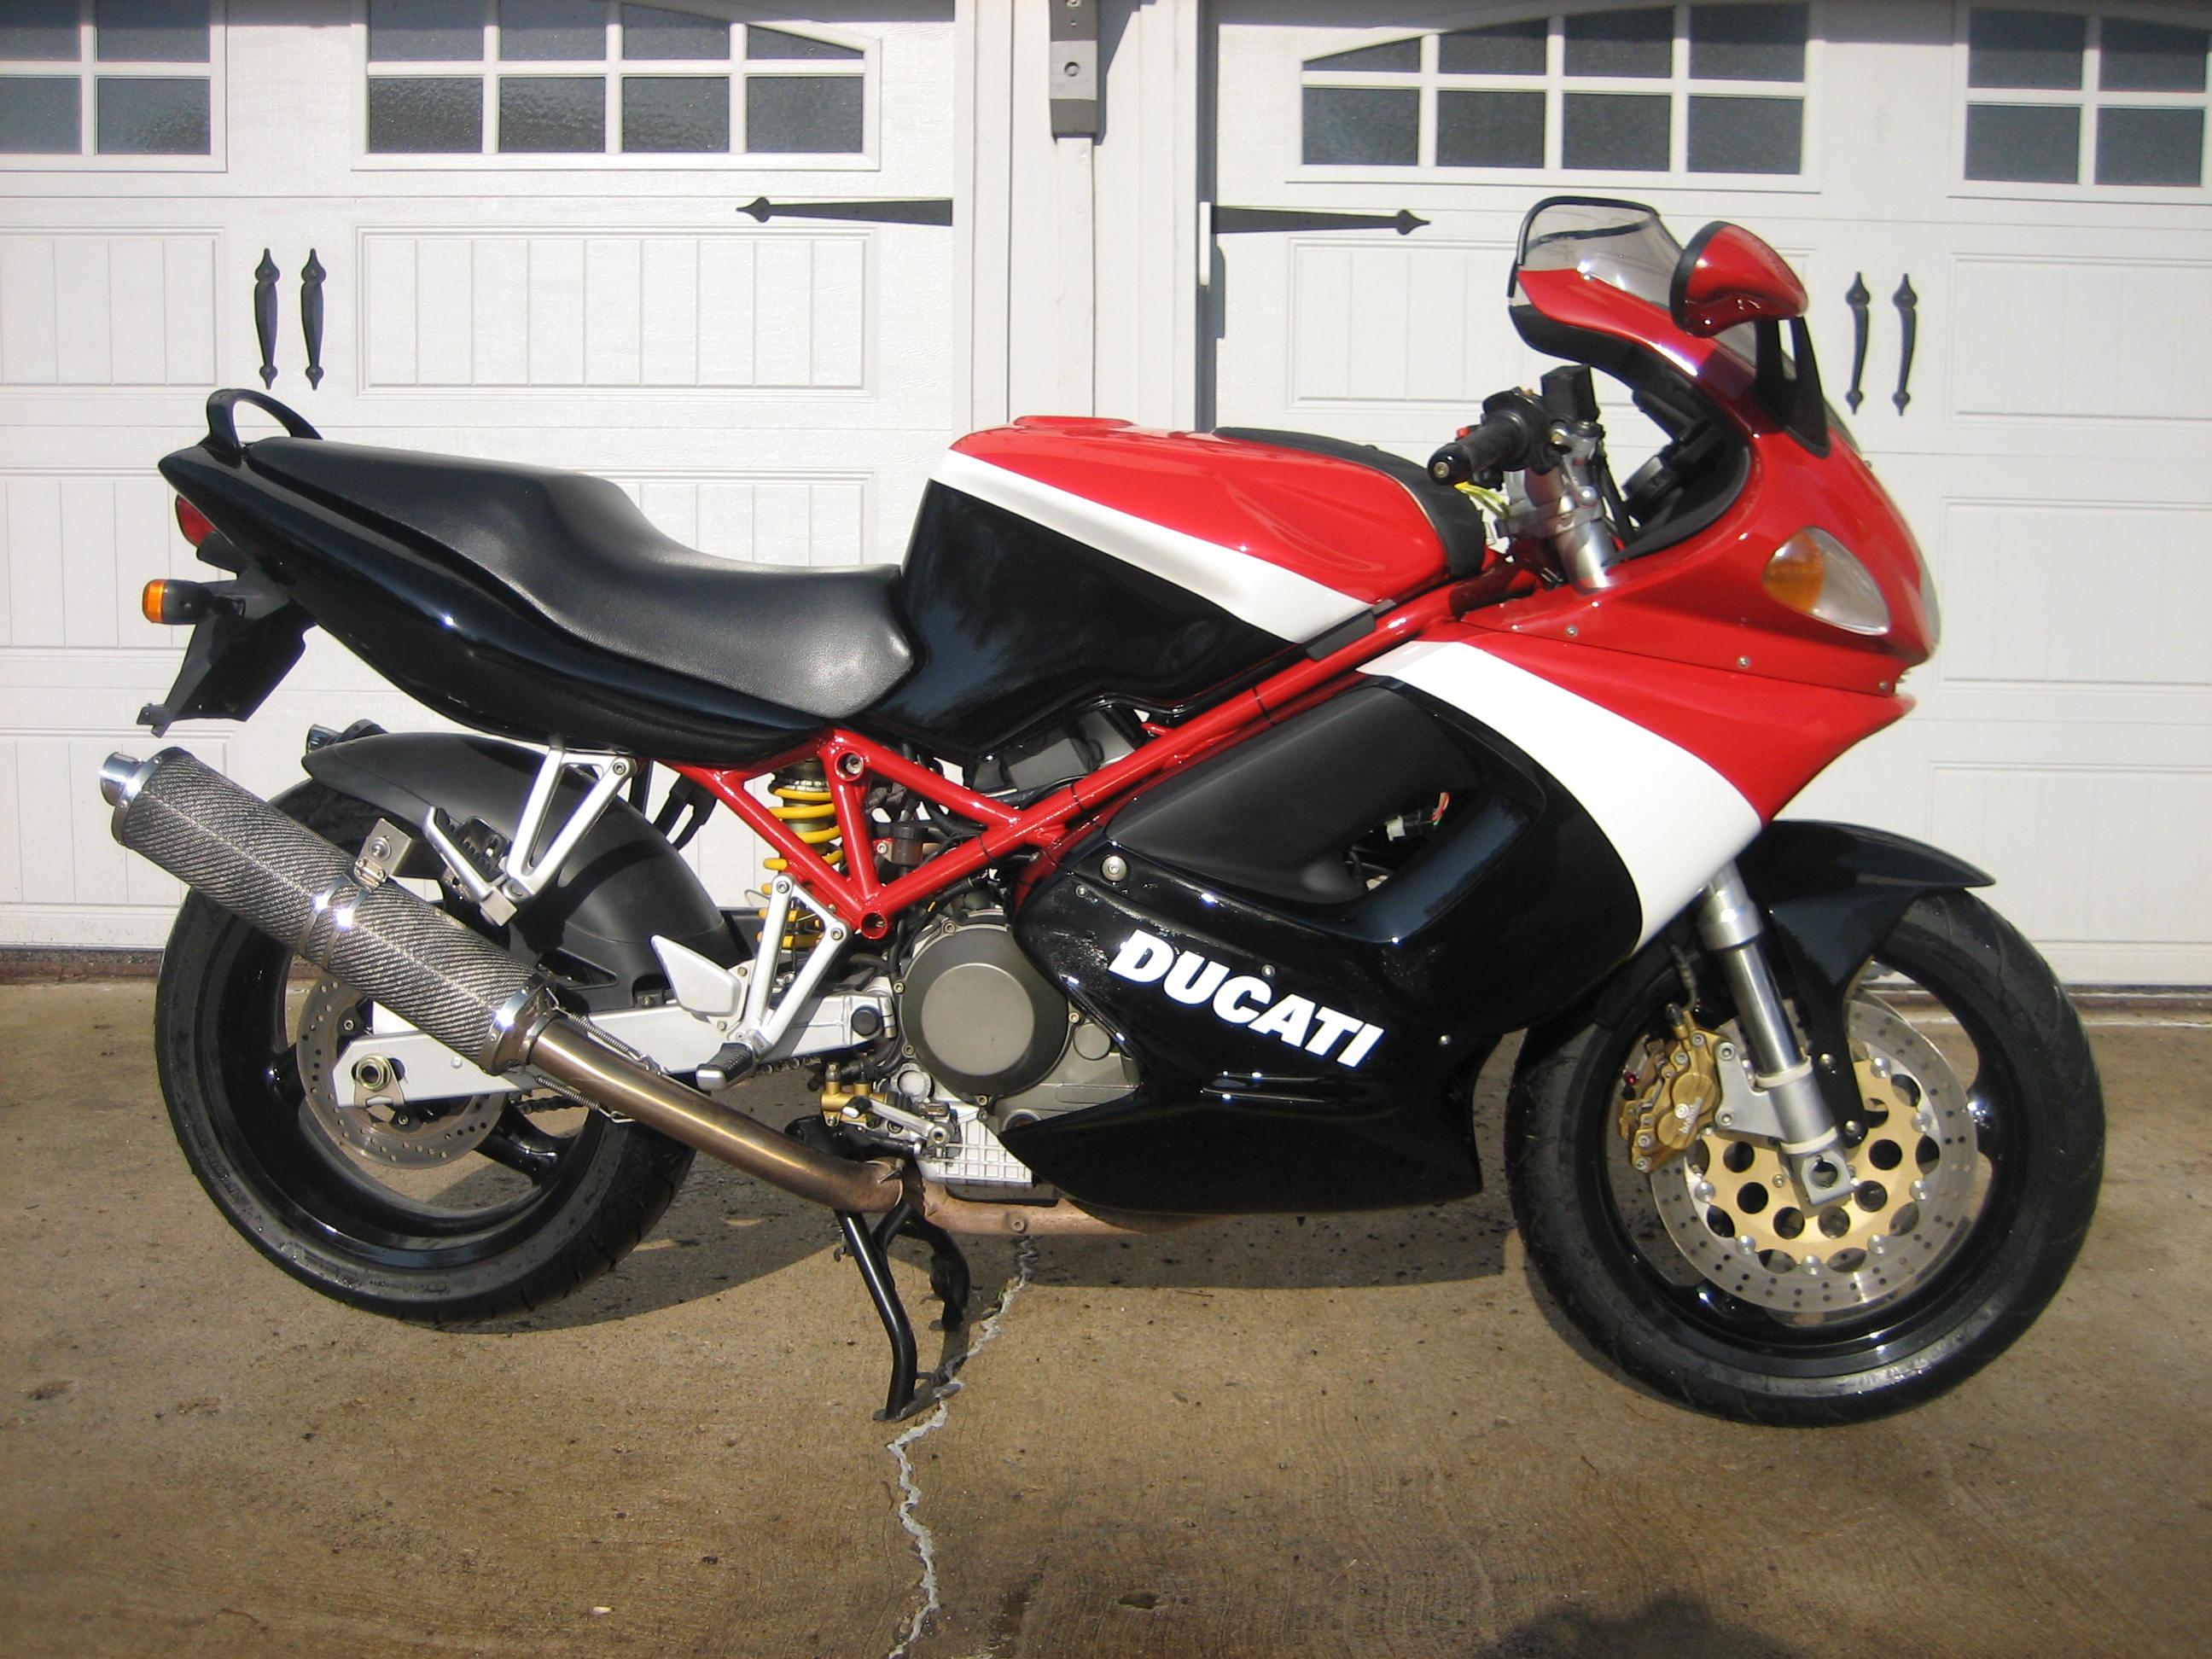 Custom paint for ST3? - Ducati ms - The Ultimate Ducati Forum